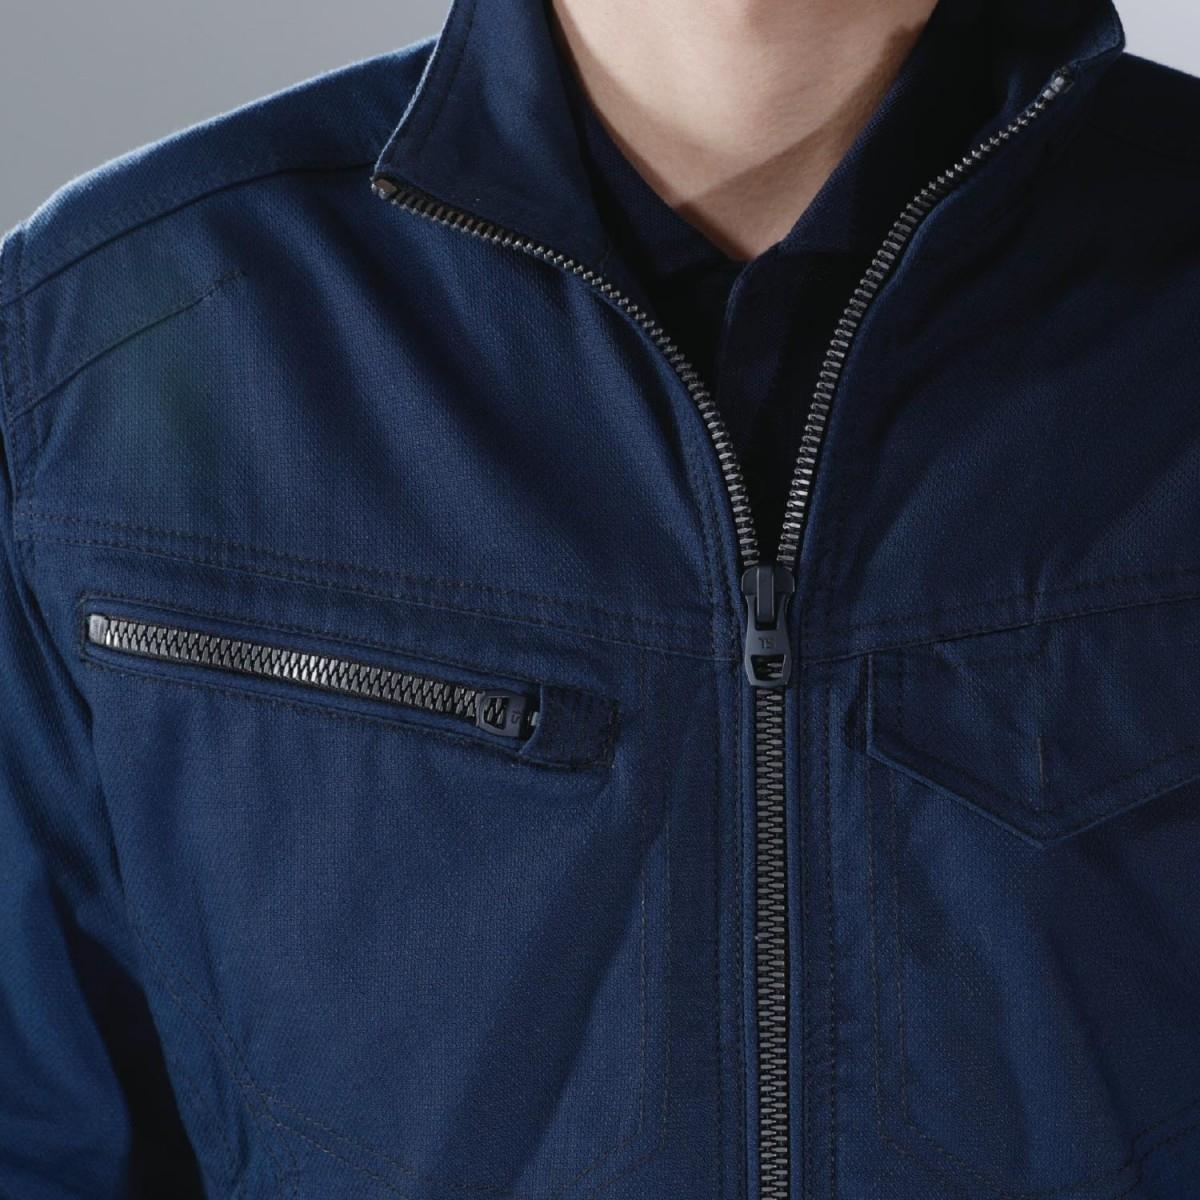 TS DESIGN 3516 ジャケット ¥5,940(税込)大型のファスナー採用。使い易さが違います。